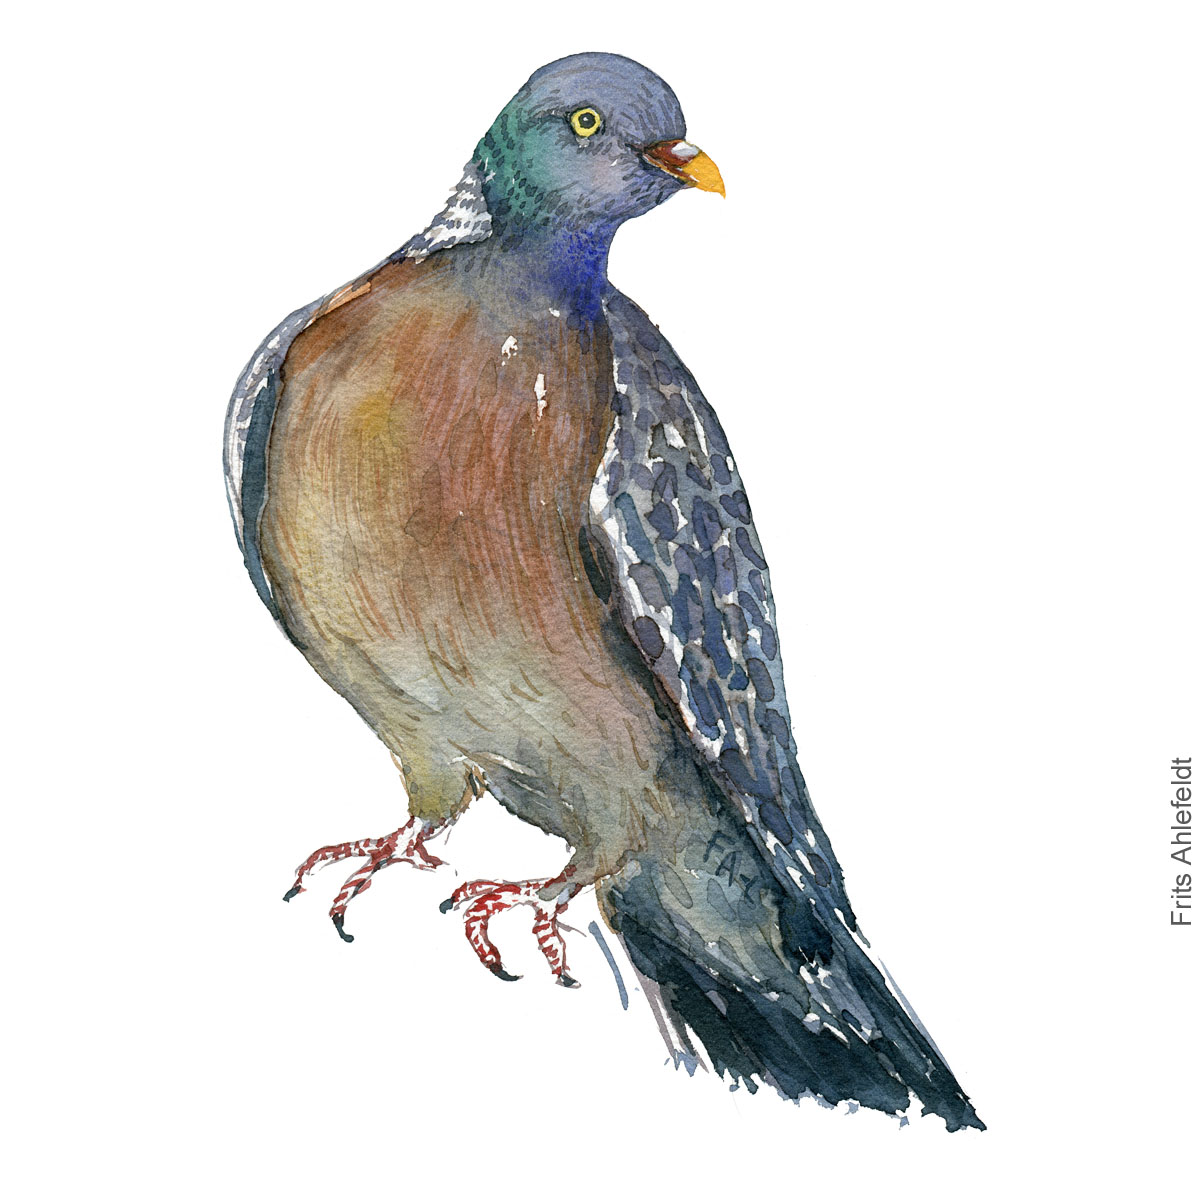 Skovdue - Wood pigeon - Bird watercolor painting. Artwork by Frits Ahlefeldt. Fugle akvarel